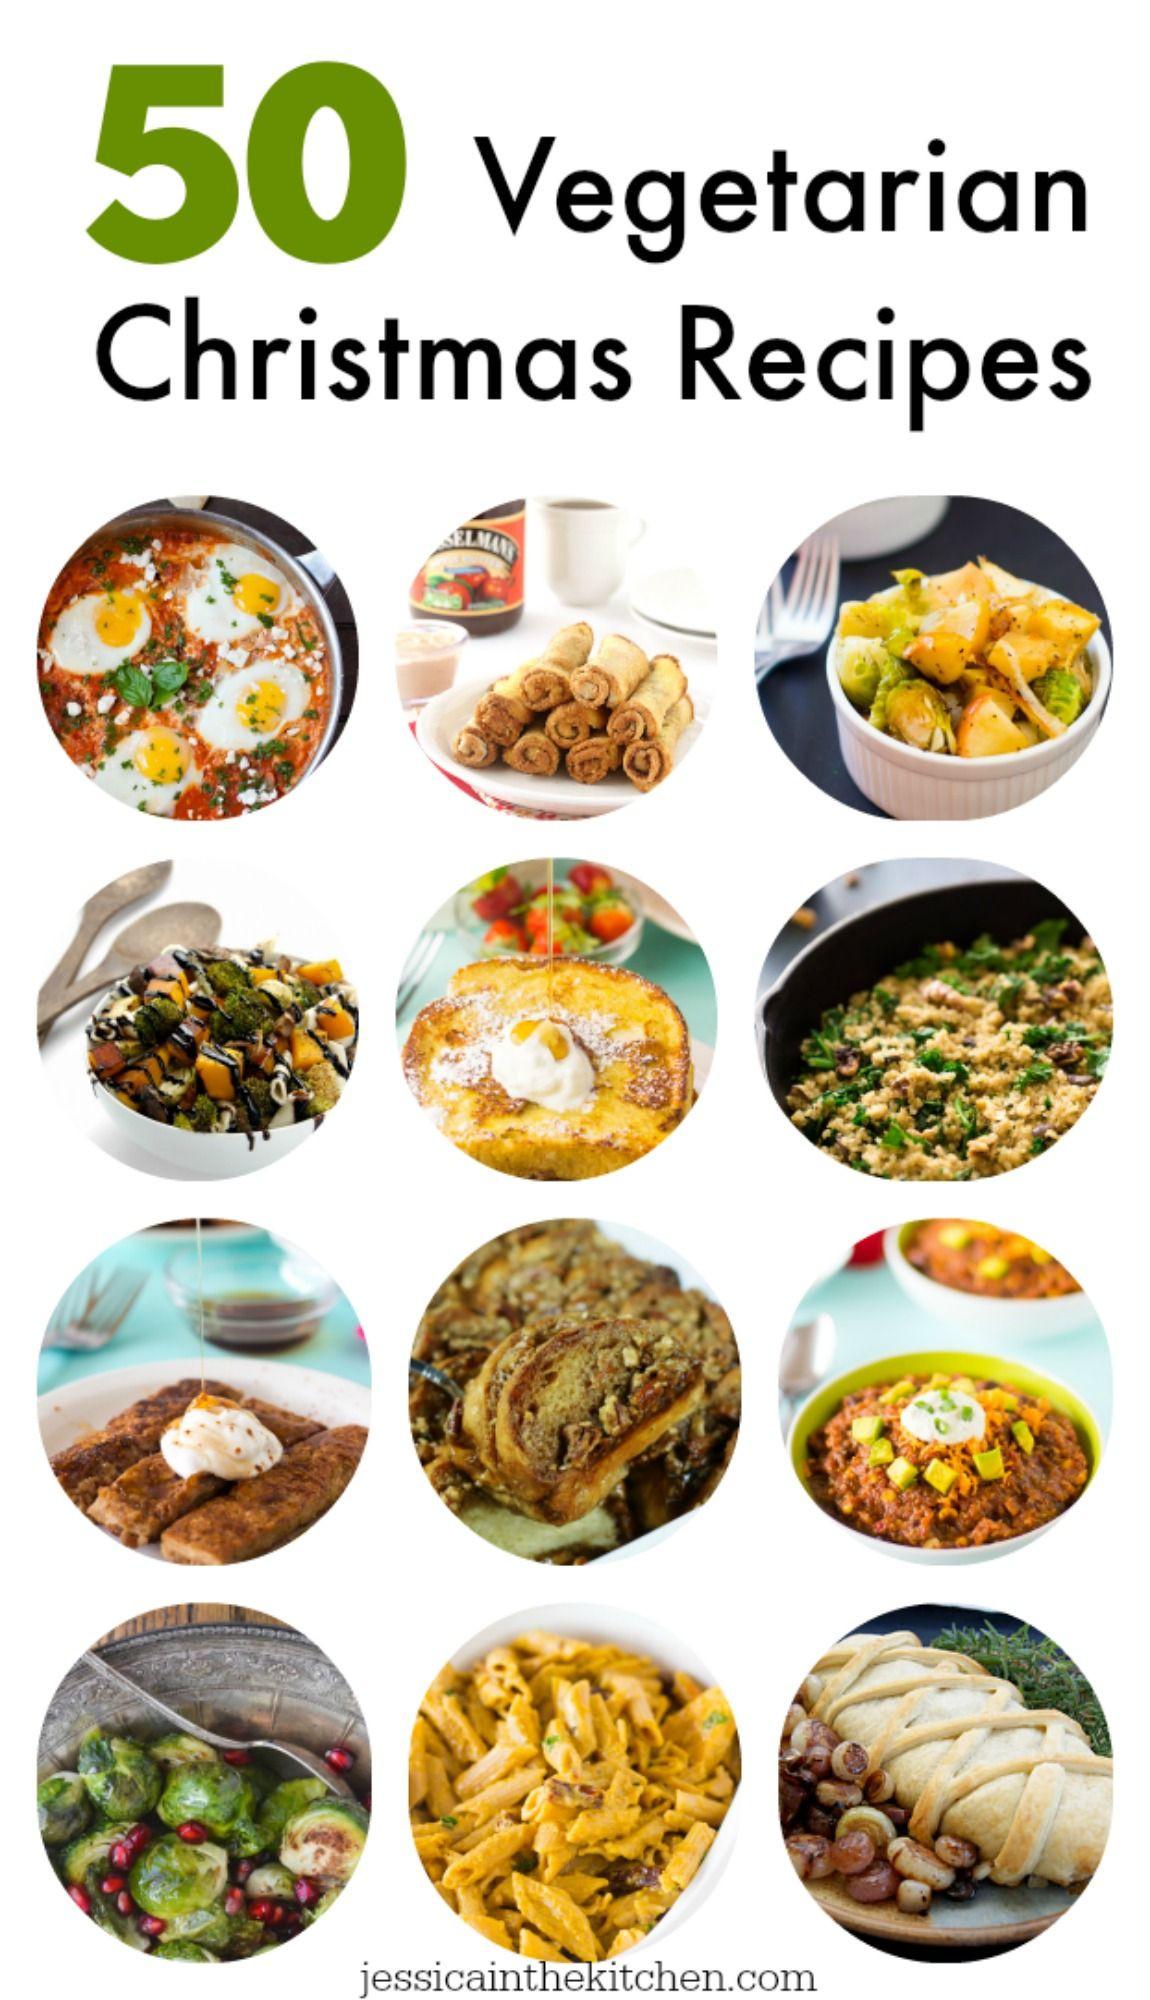 Vegetarian Christmas Dinner Menu  Best 25 Ve arian christmas recipes ideas on Pinterest